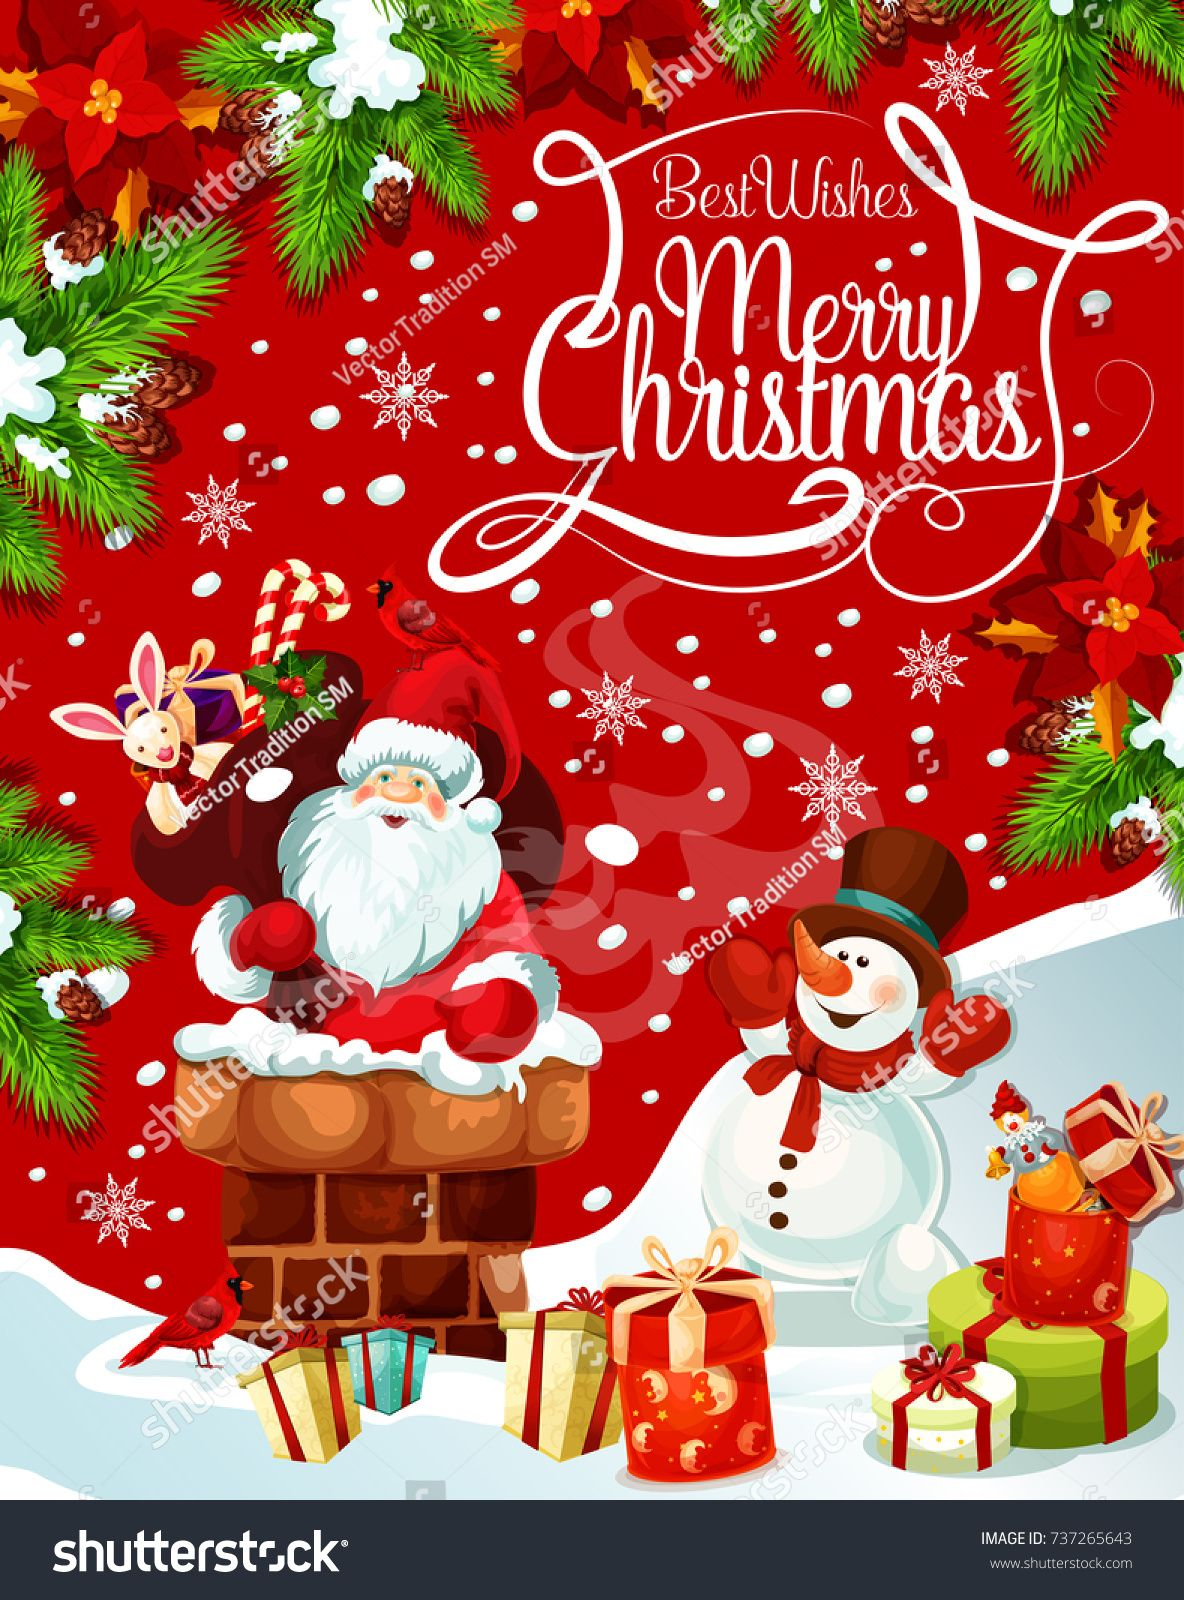 Happy Christmas & Marry Nurse (Pin Follow & Share ) 🏥💉😄